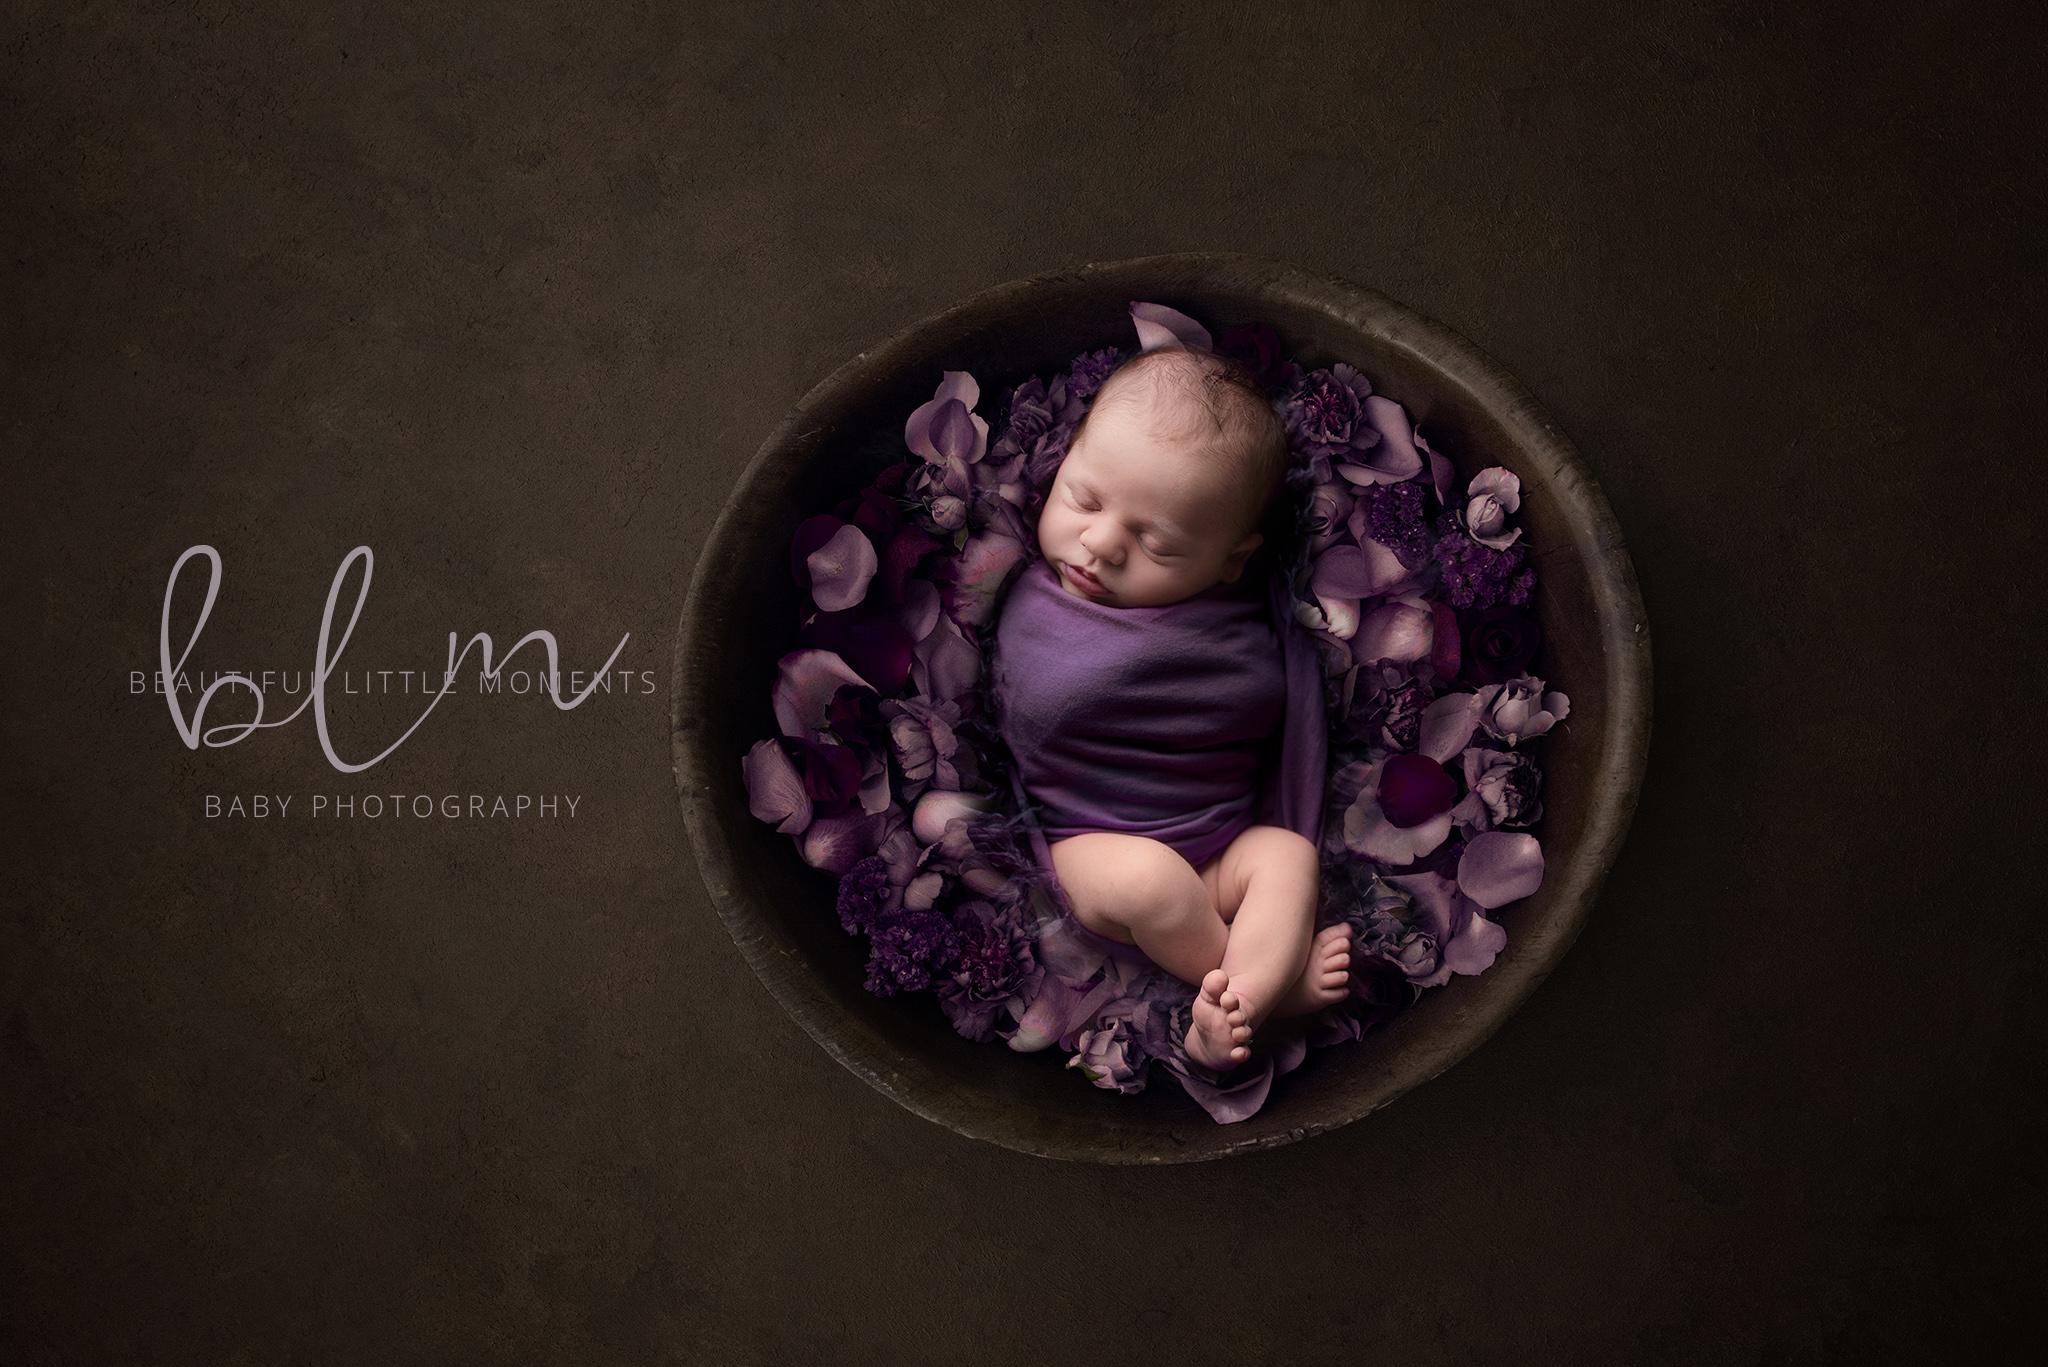 newborn-boy-brown-purple-bowl-flowers-crop